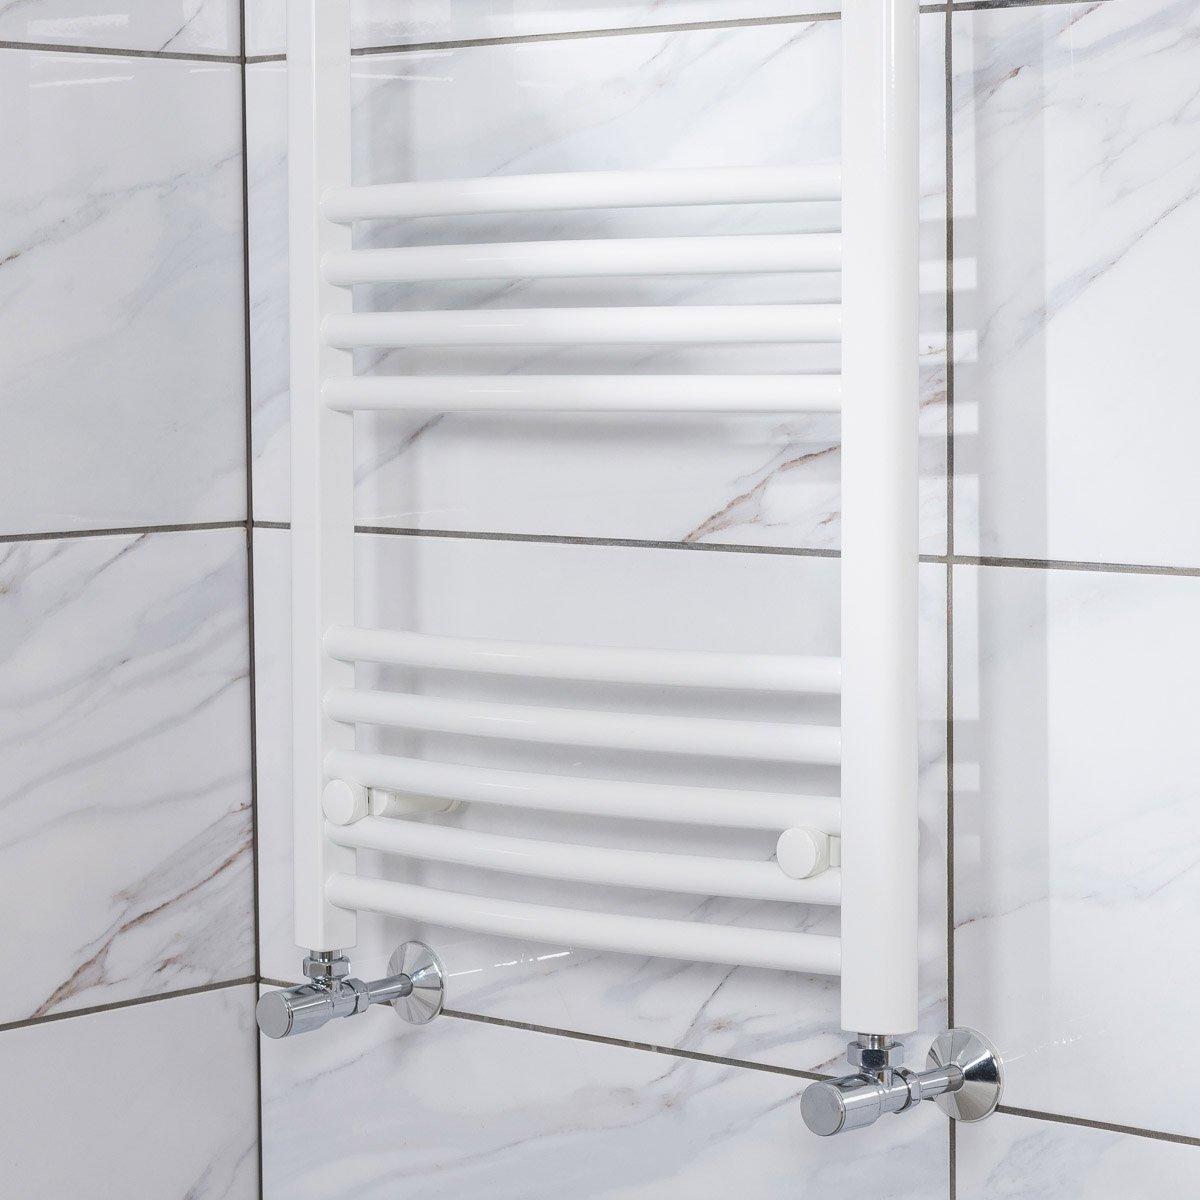 White Bathroom Radiators: Designer White Curved Bathroom Heated Ladder Towel Rail